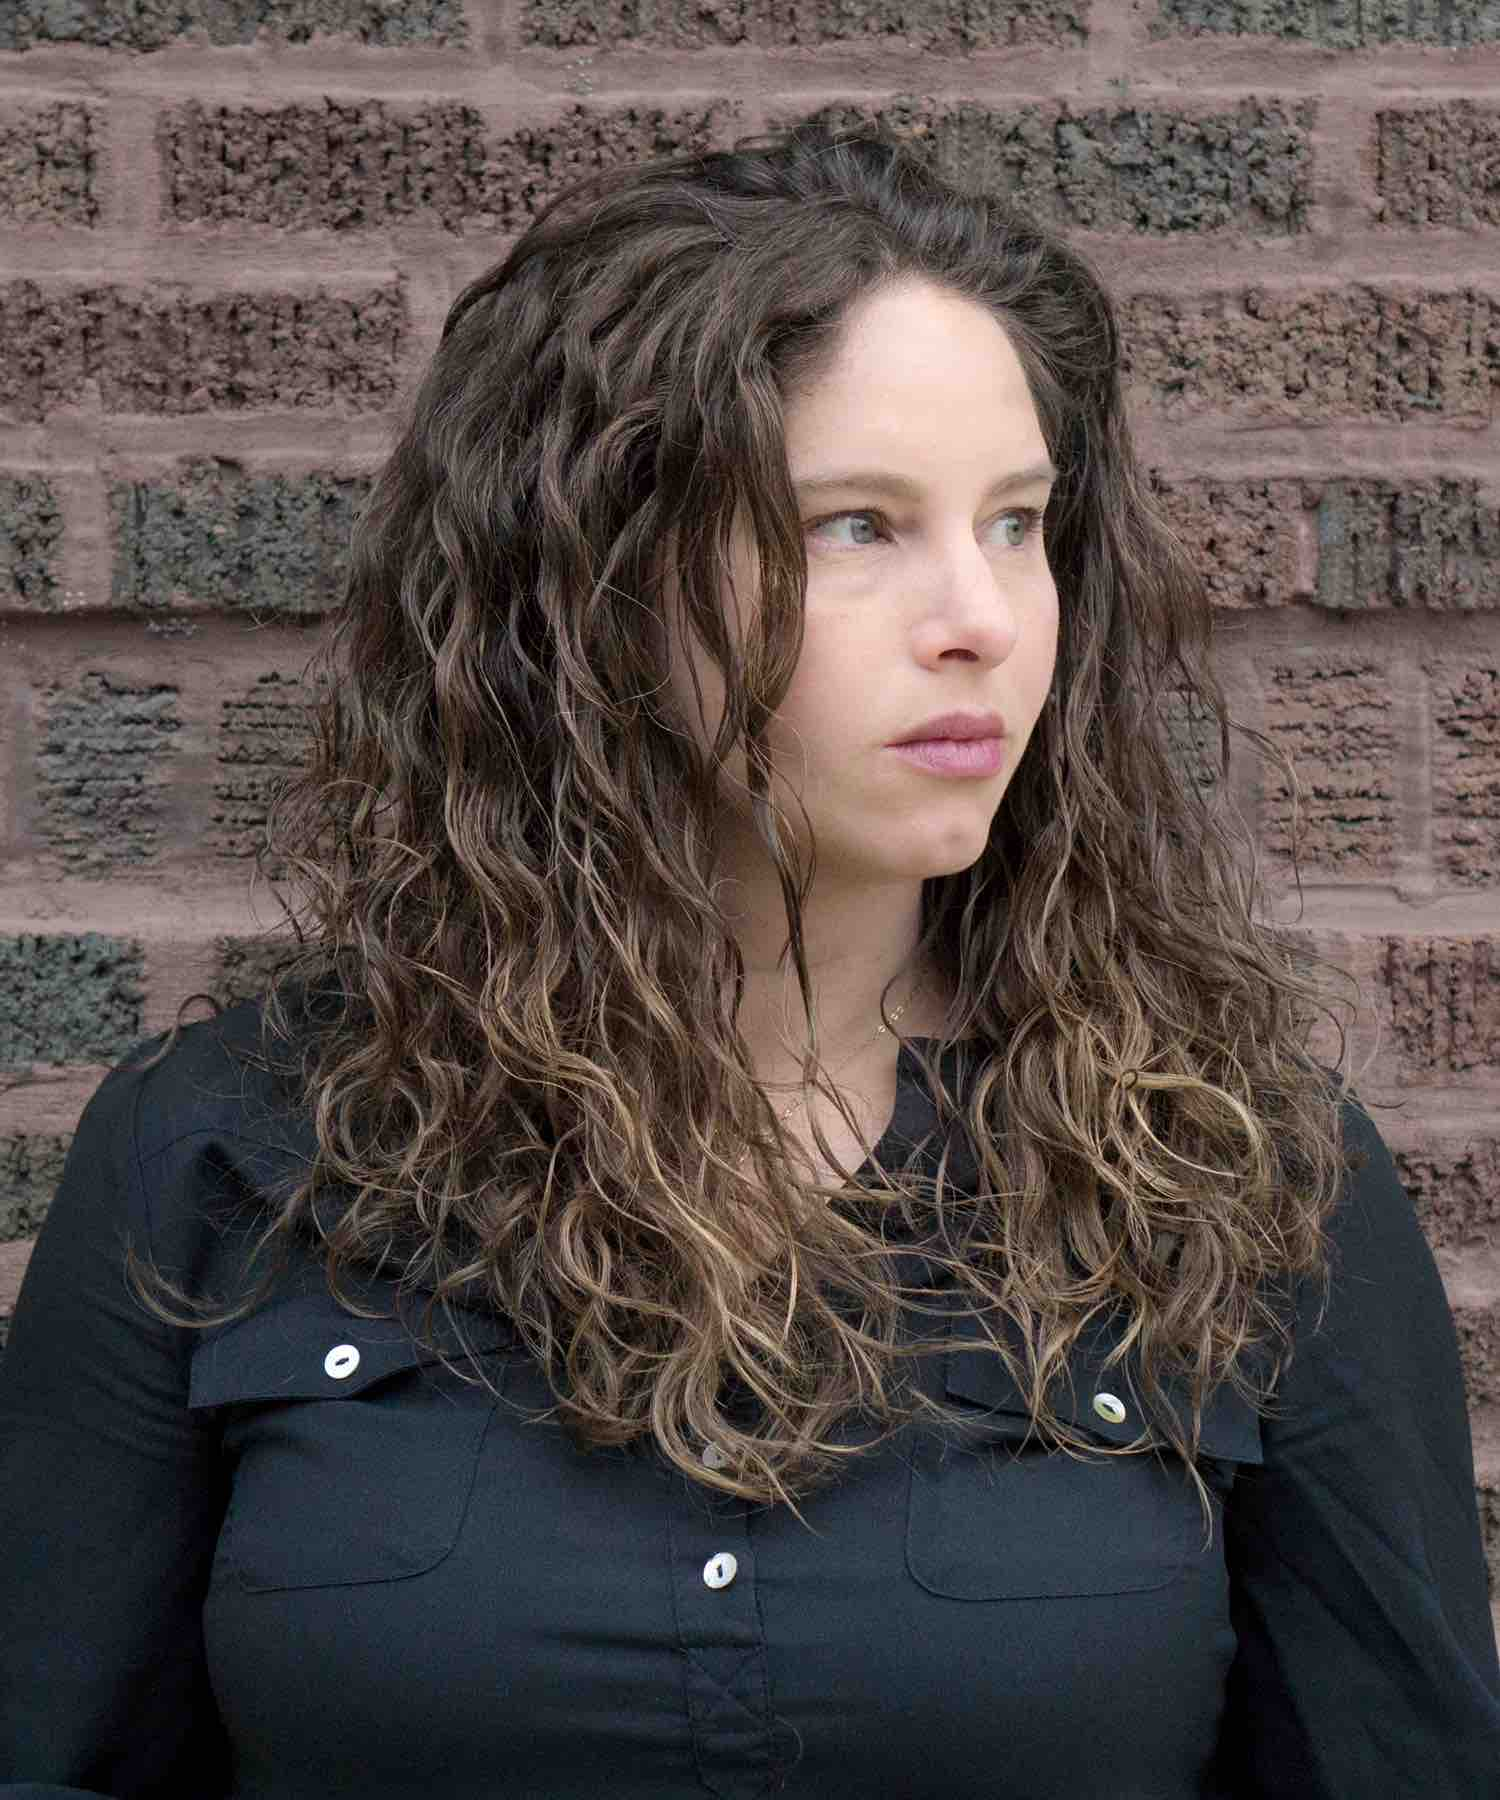 Photo of Jessica Ziparo by John McHugh